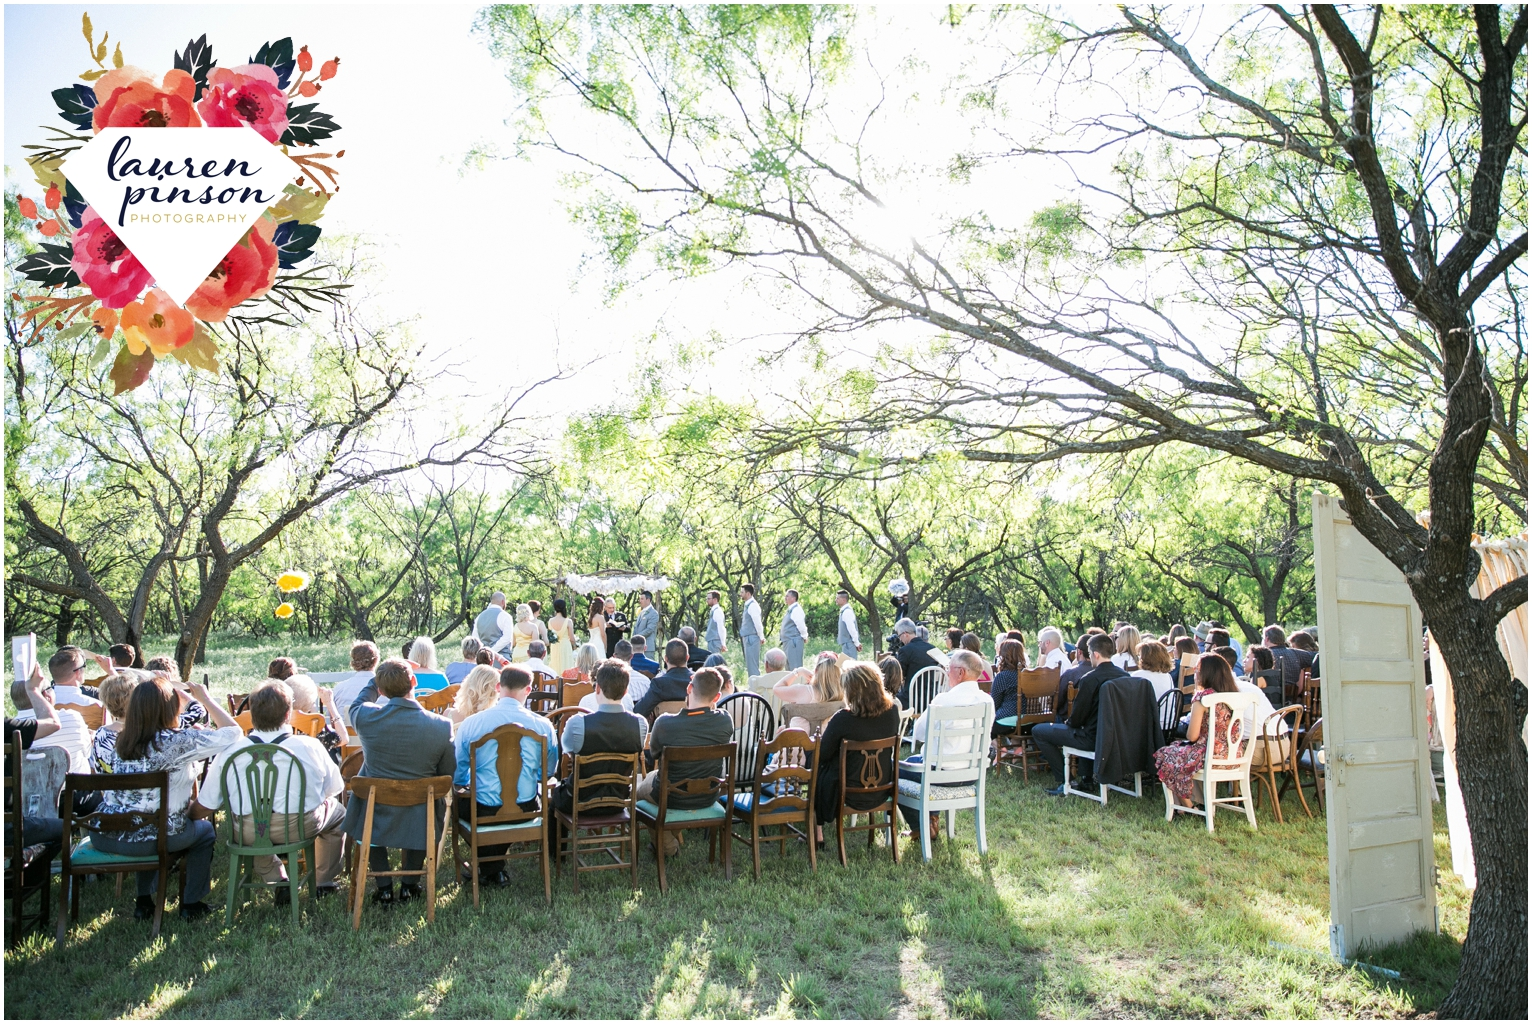 wichita-falls-wedding-photographer-oklahoma-wichita-mountains-bridal-session-bridals-photography_0740.jpg